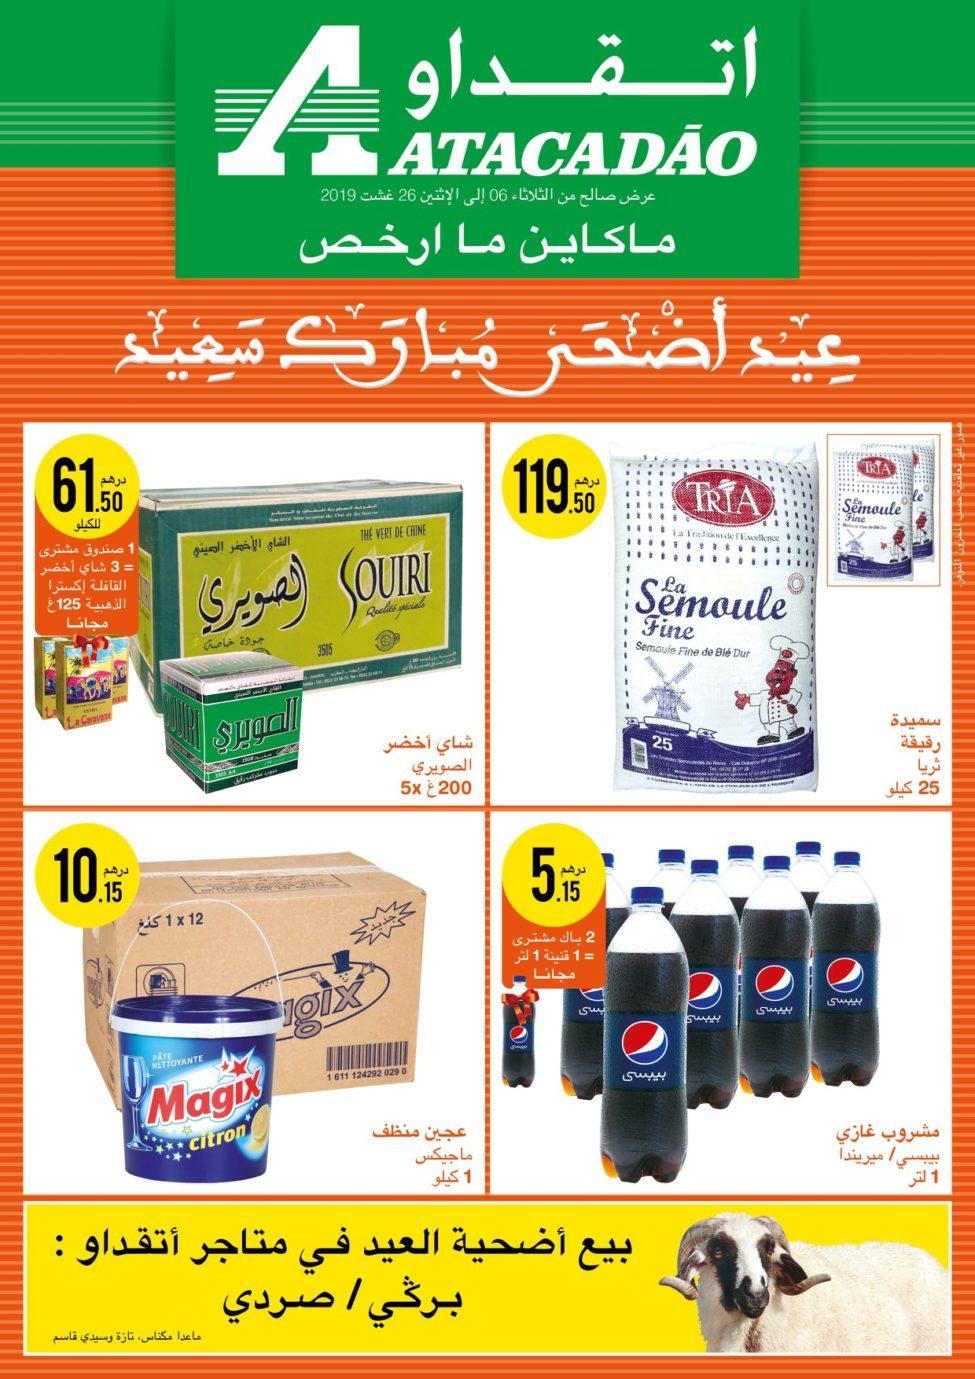 Catalogue Atacadao Maroc عيد الأضحى du 6 au 26 Août 2019